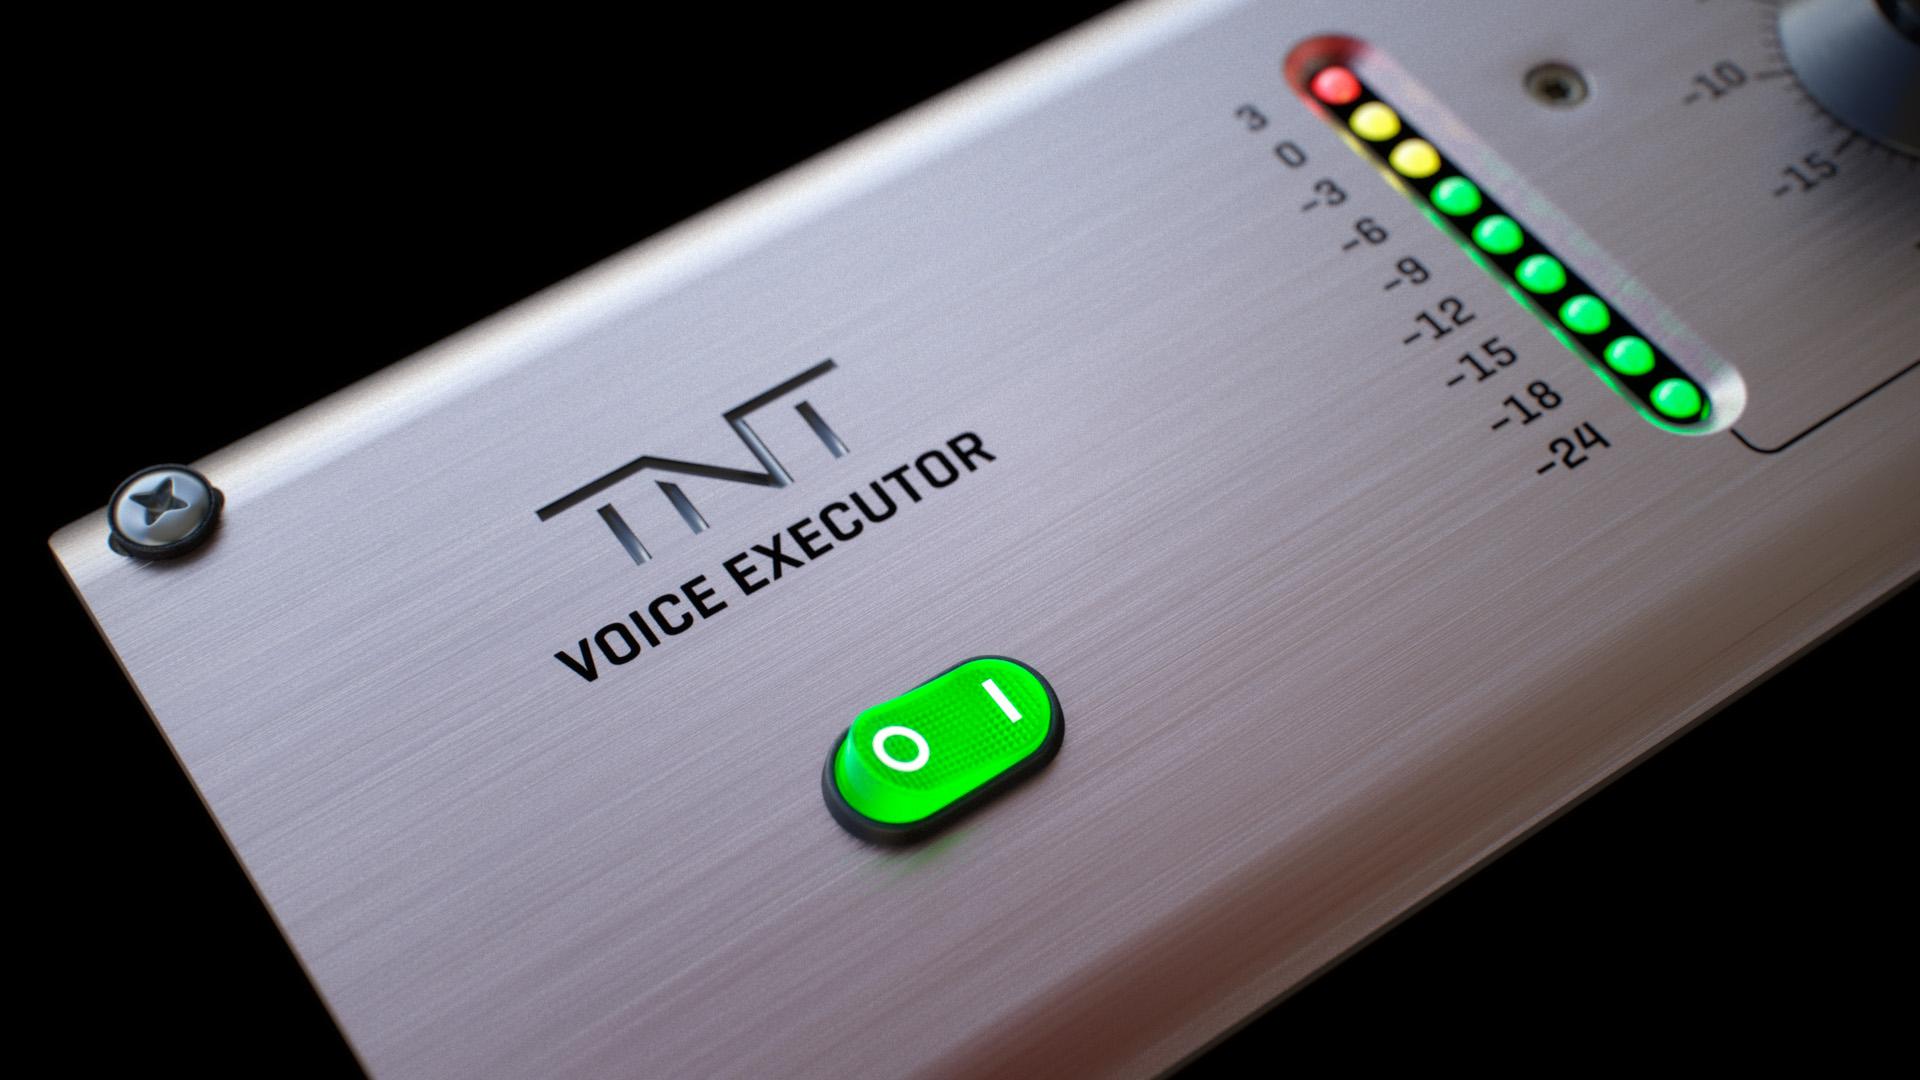 TNT Voice Executor